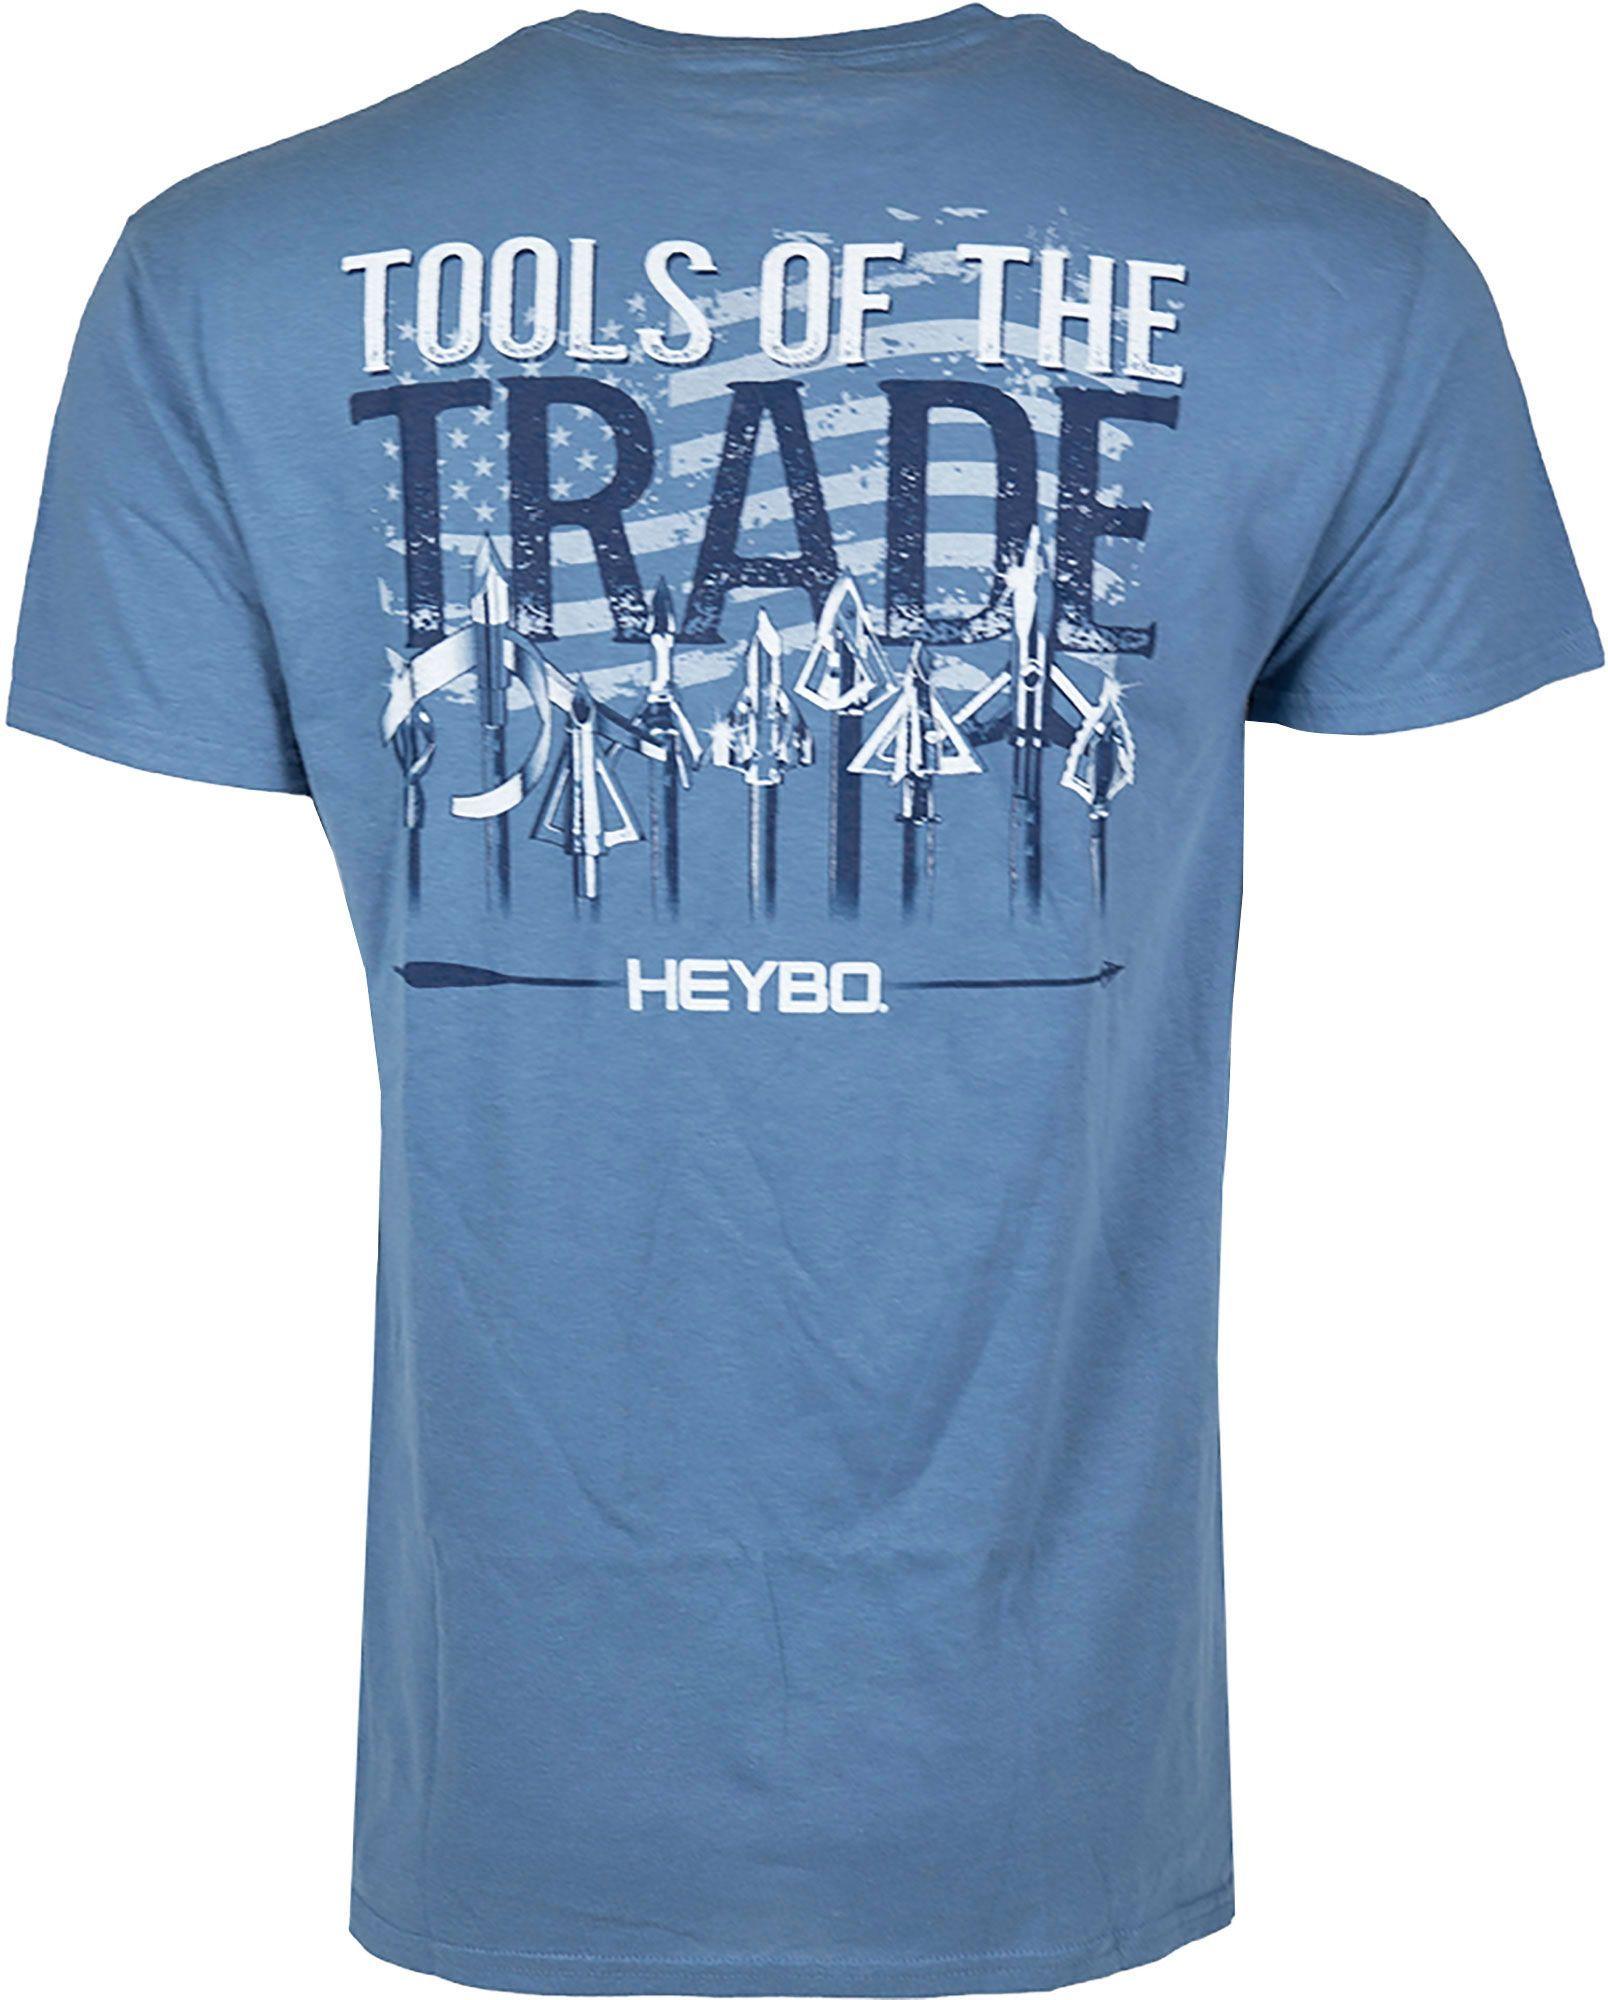 a8e4f059 HeyBo Definition Long Sleeve T-Shirt - White #heybo | Hey Bo | T shirt,  Long sleeve, Fishing shirts